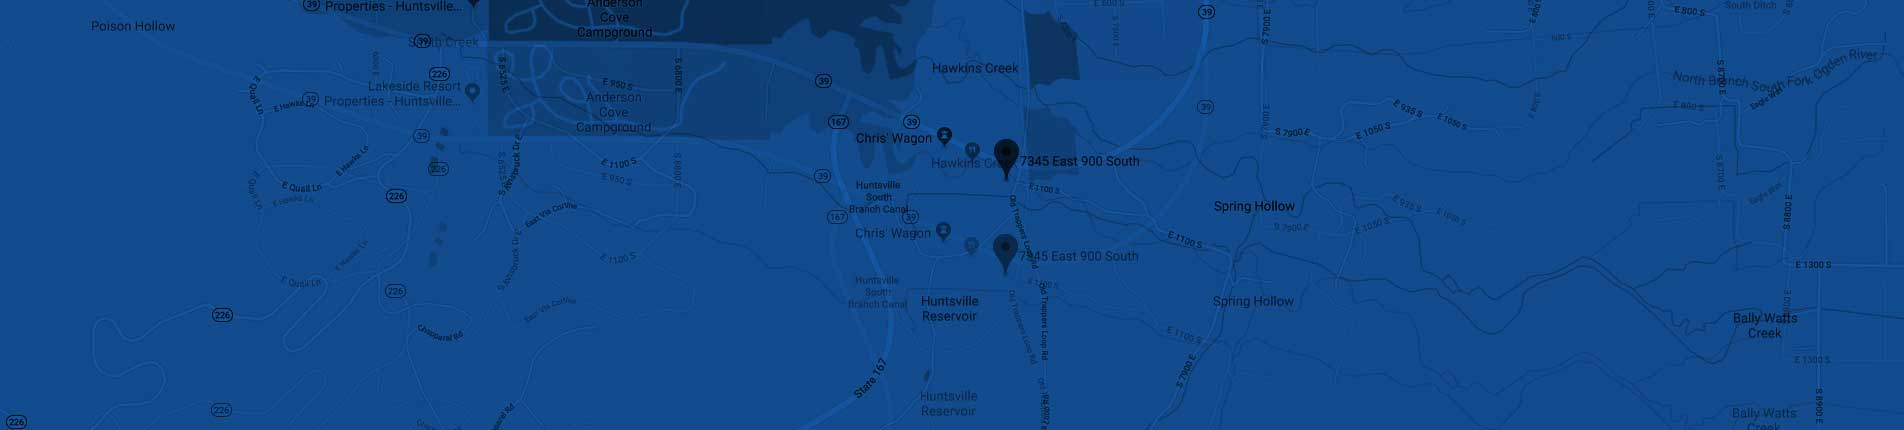 ovs map